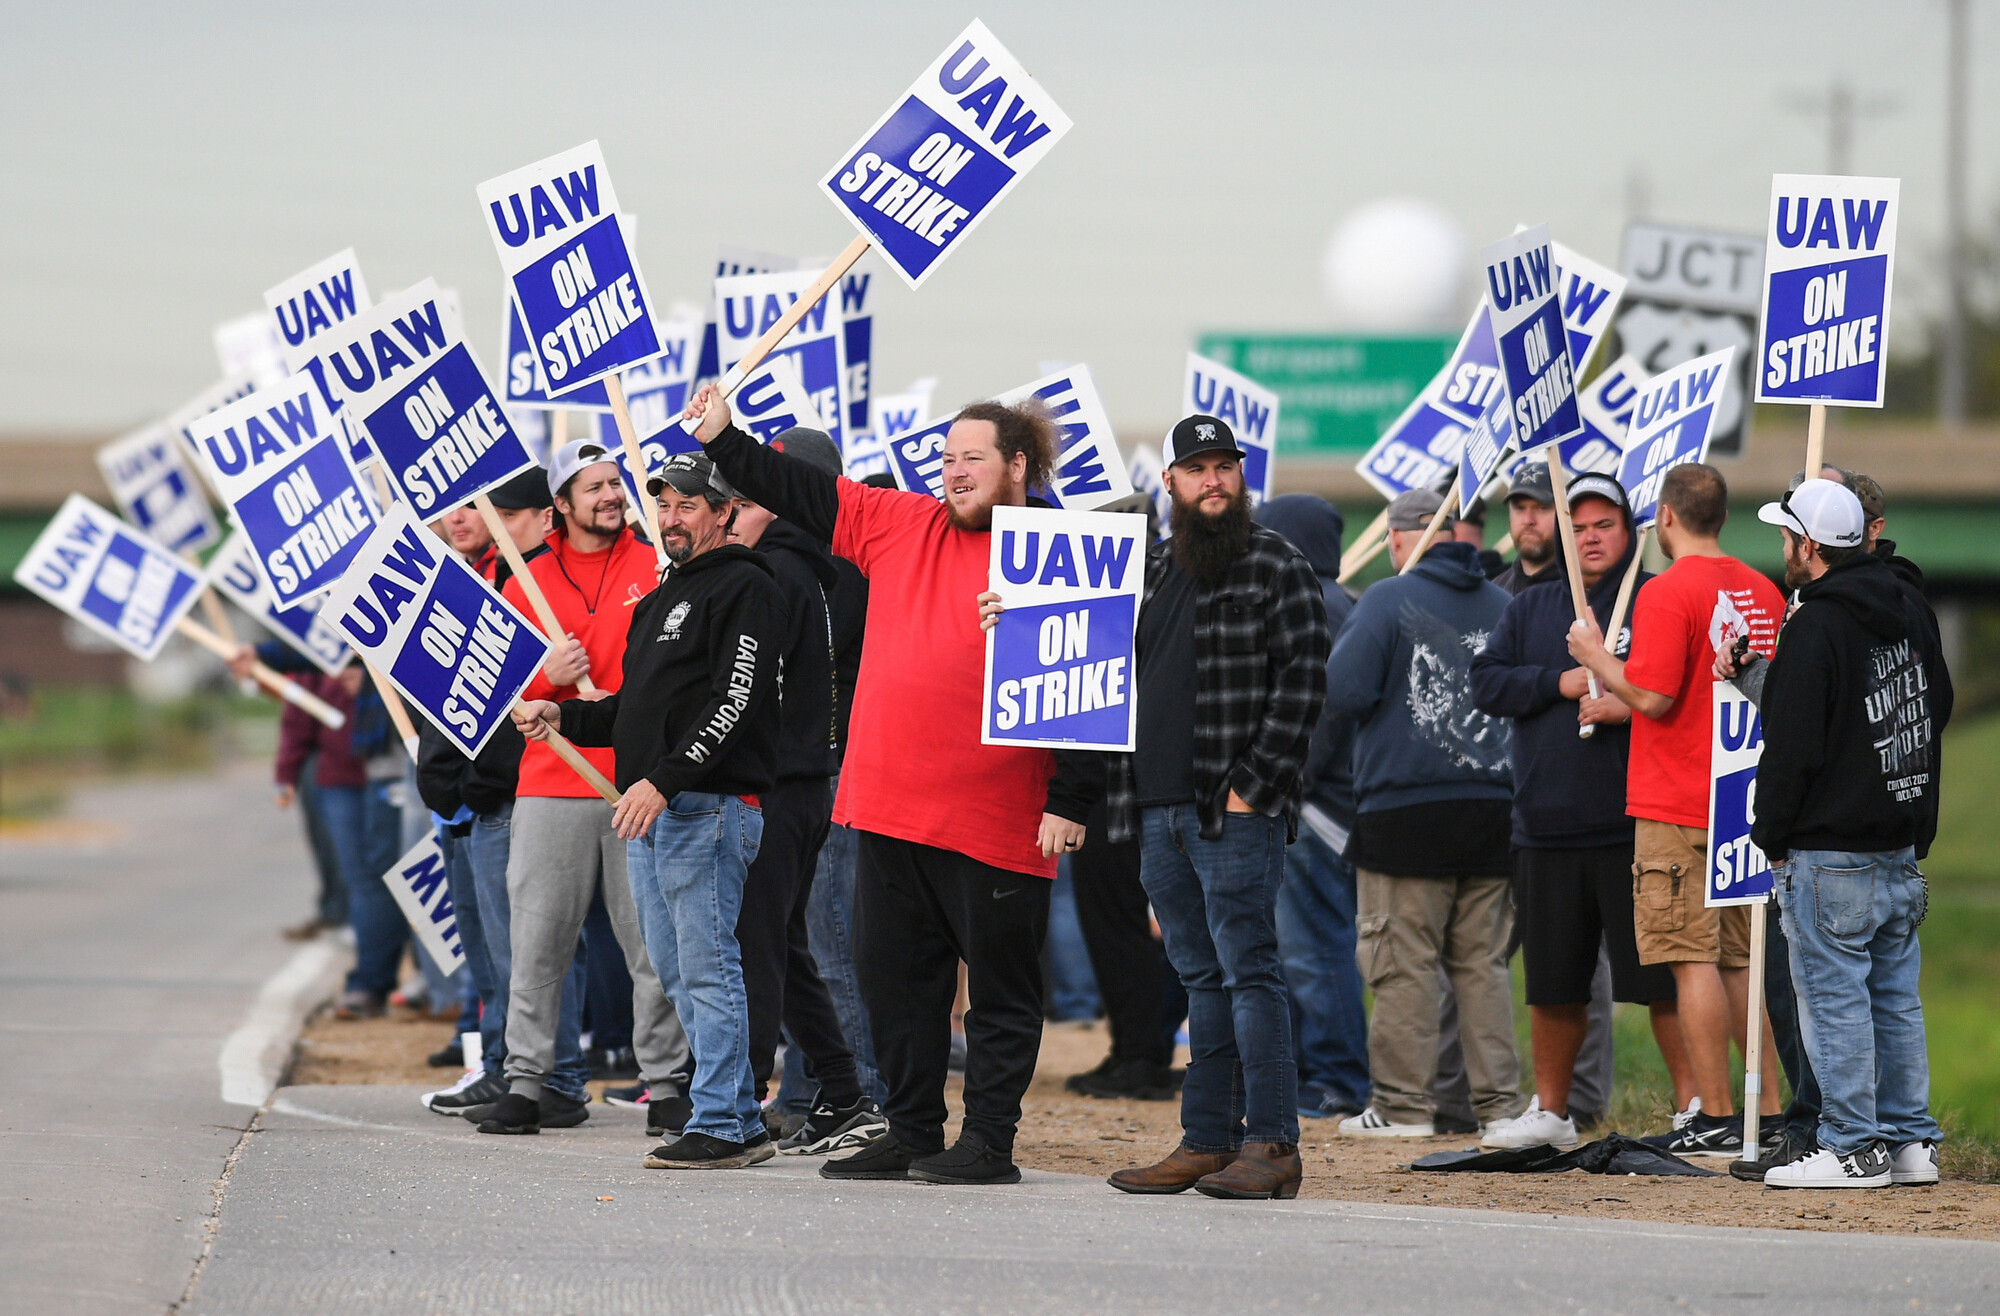 Elizabeth Warren backs Deere strike, saying workers have gotten the short end of the stick 'for decades'